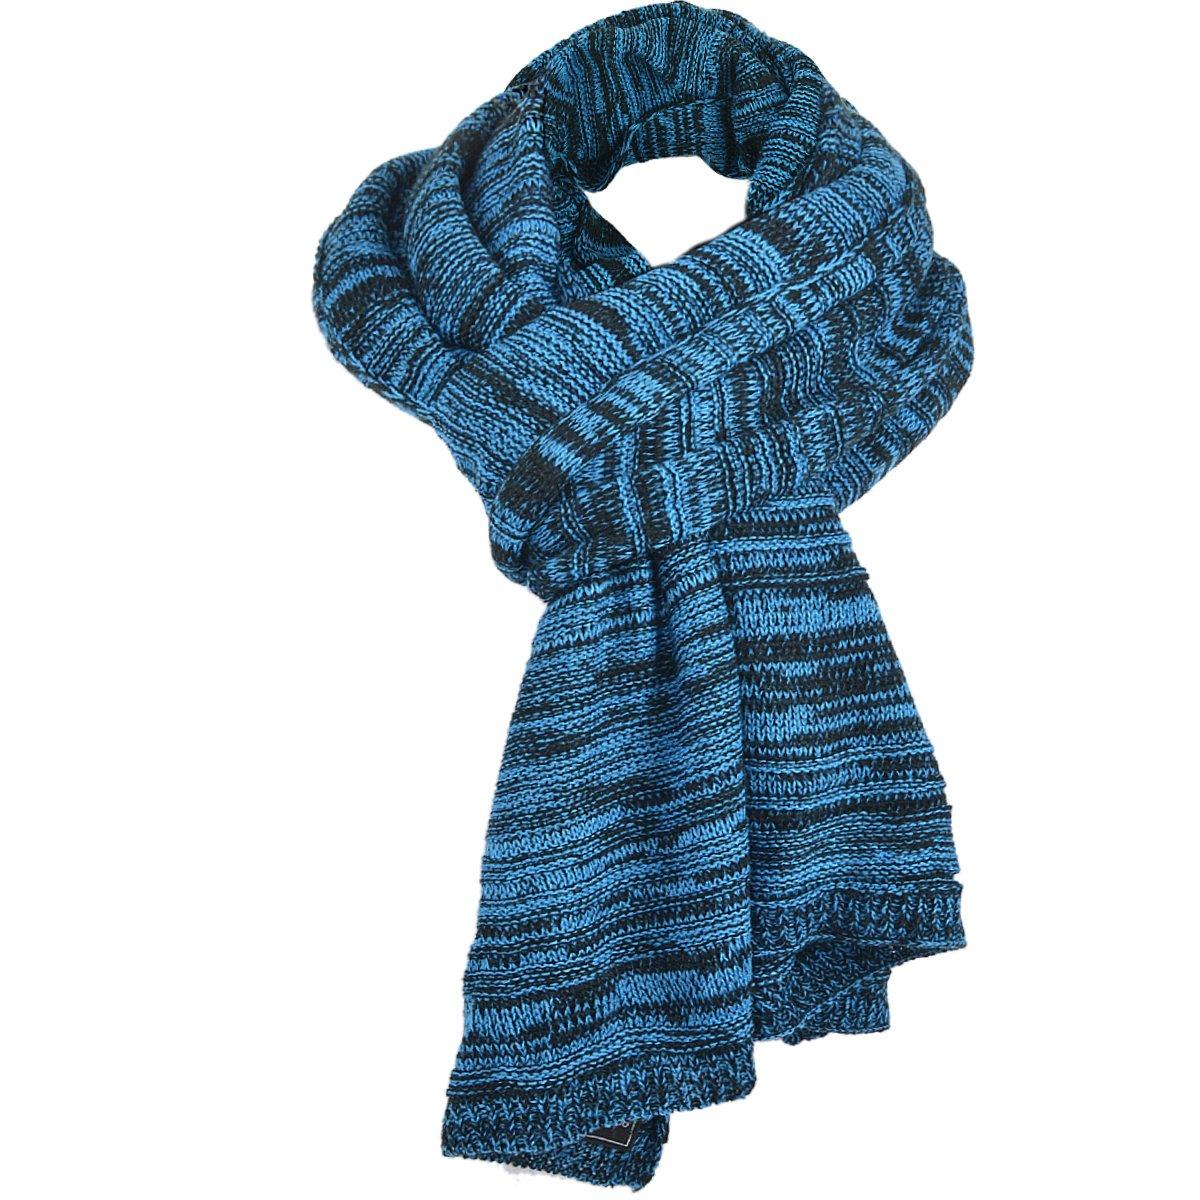 Classic Men Women Two-tone Knit Winter Scarf Oversize E5001 (Bright Blue with Black)